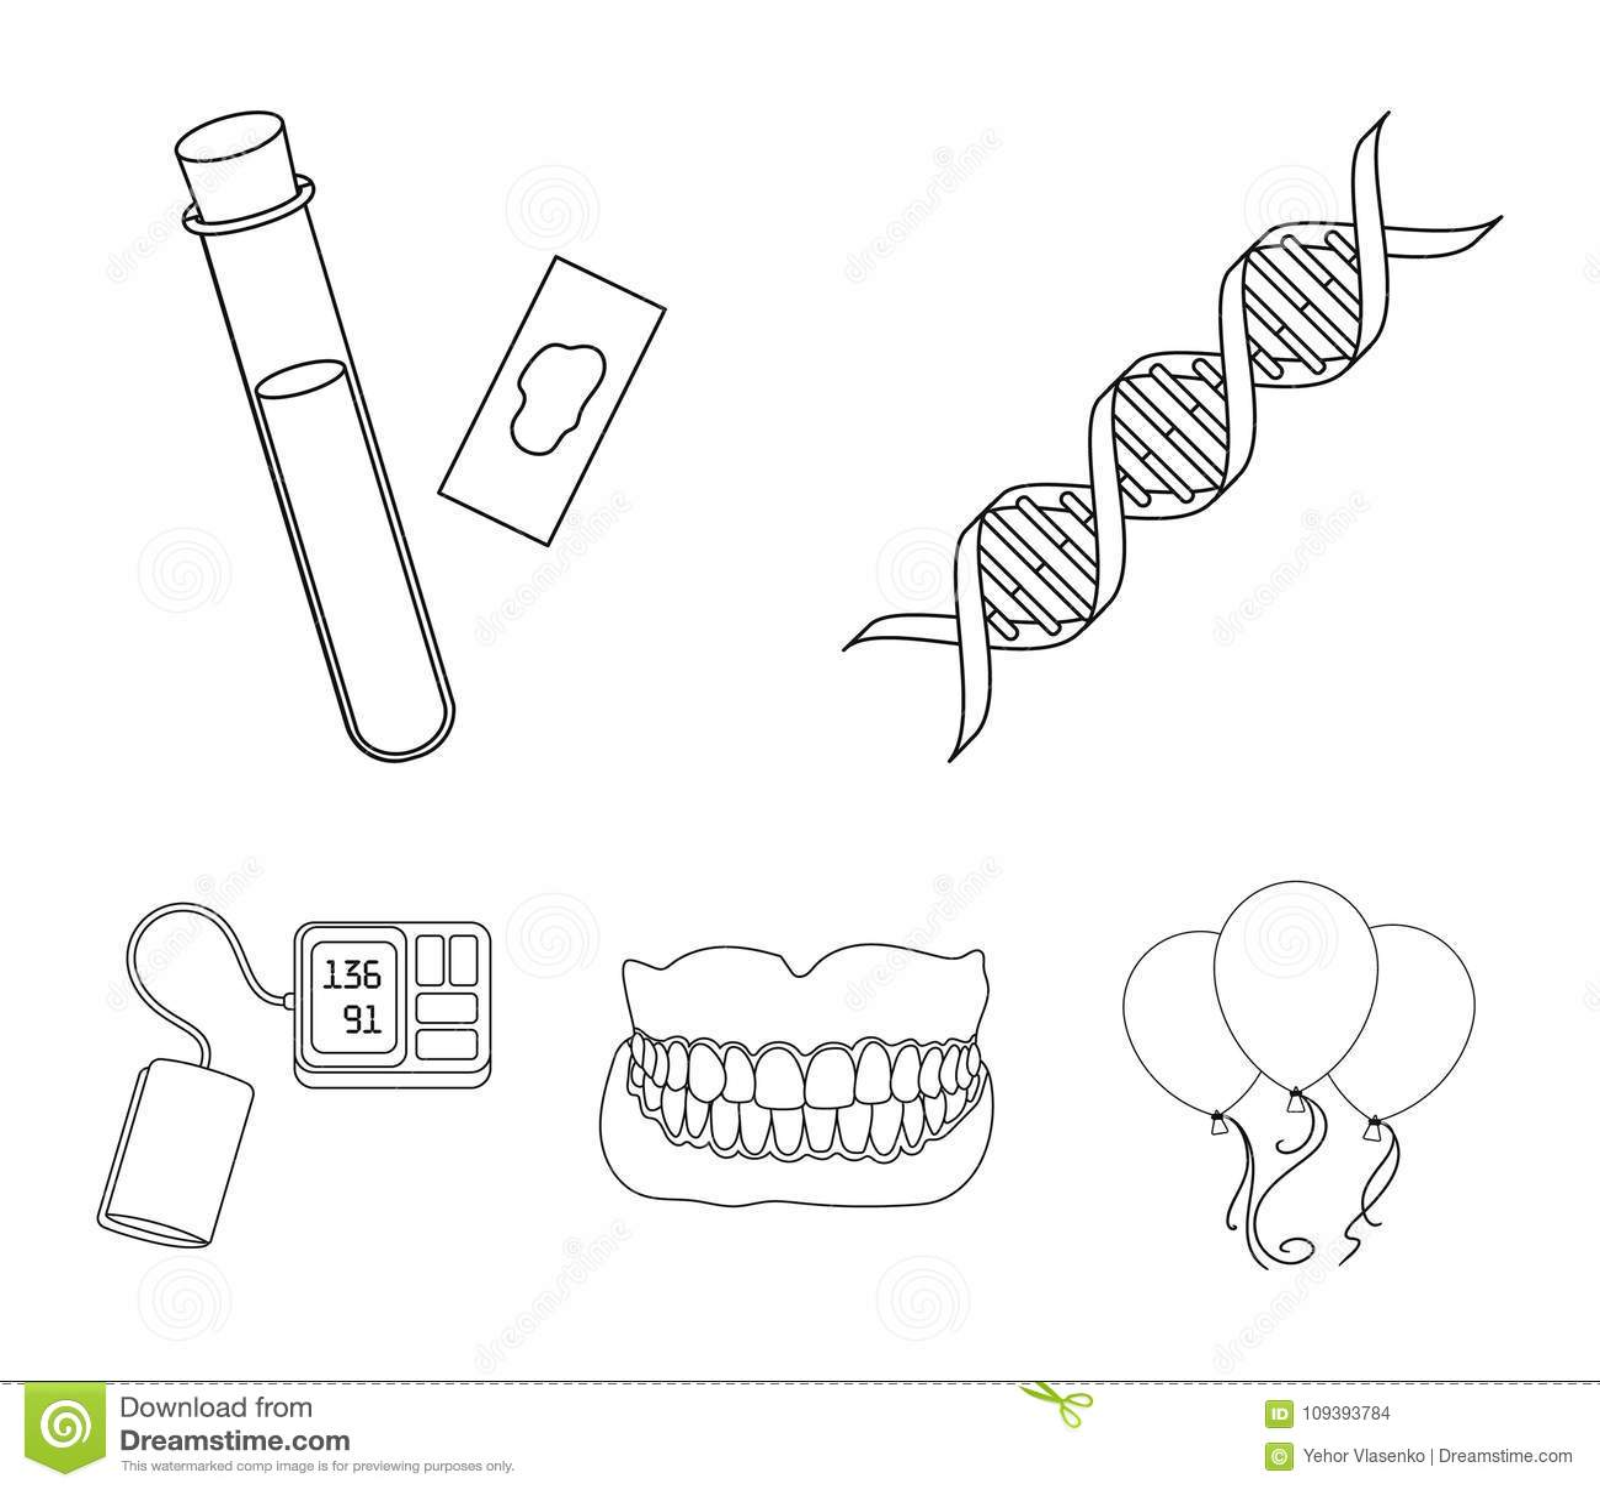 Dna code blood test in vitro denture tonometer medicine set dna code blood test in vitro denture tonometer medicine set collection icons in outline style vector symbol stock buycottarizona Images